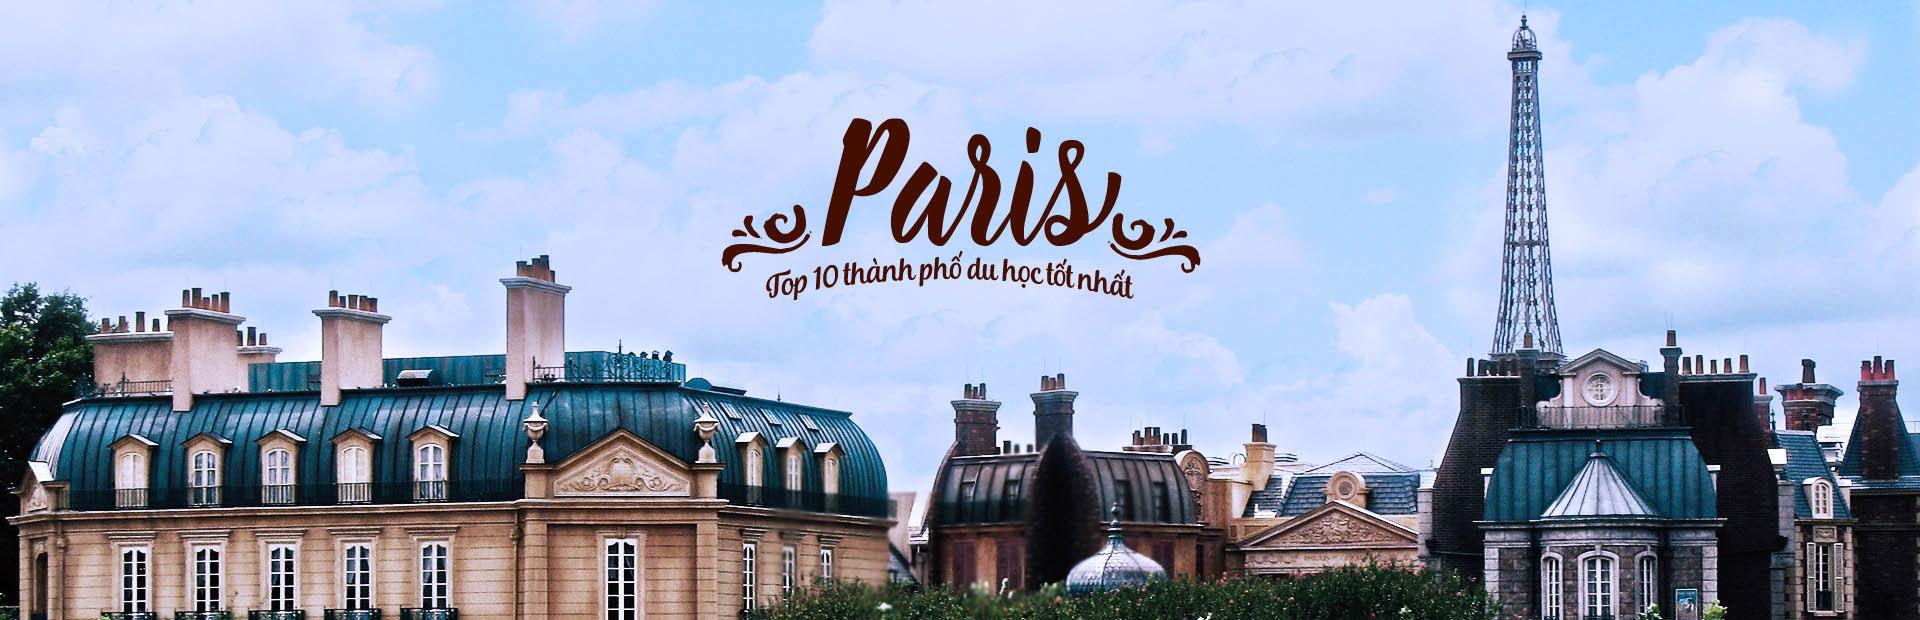 banner-paris